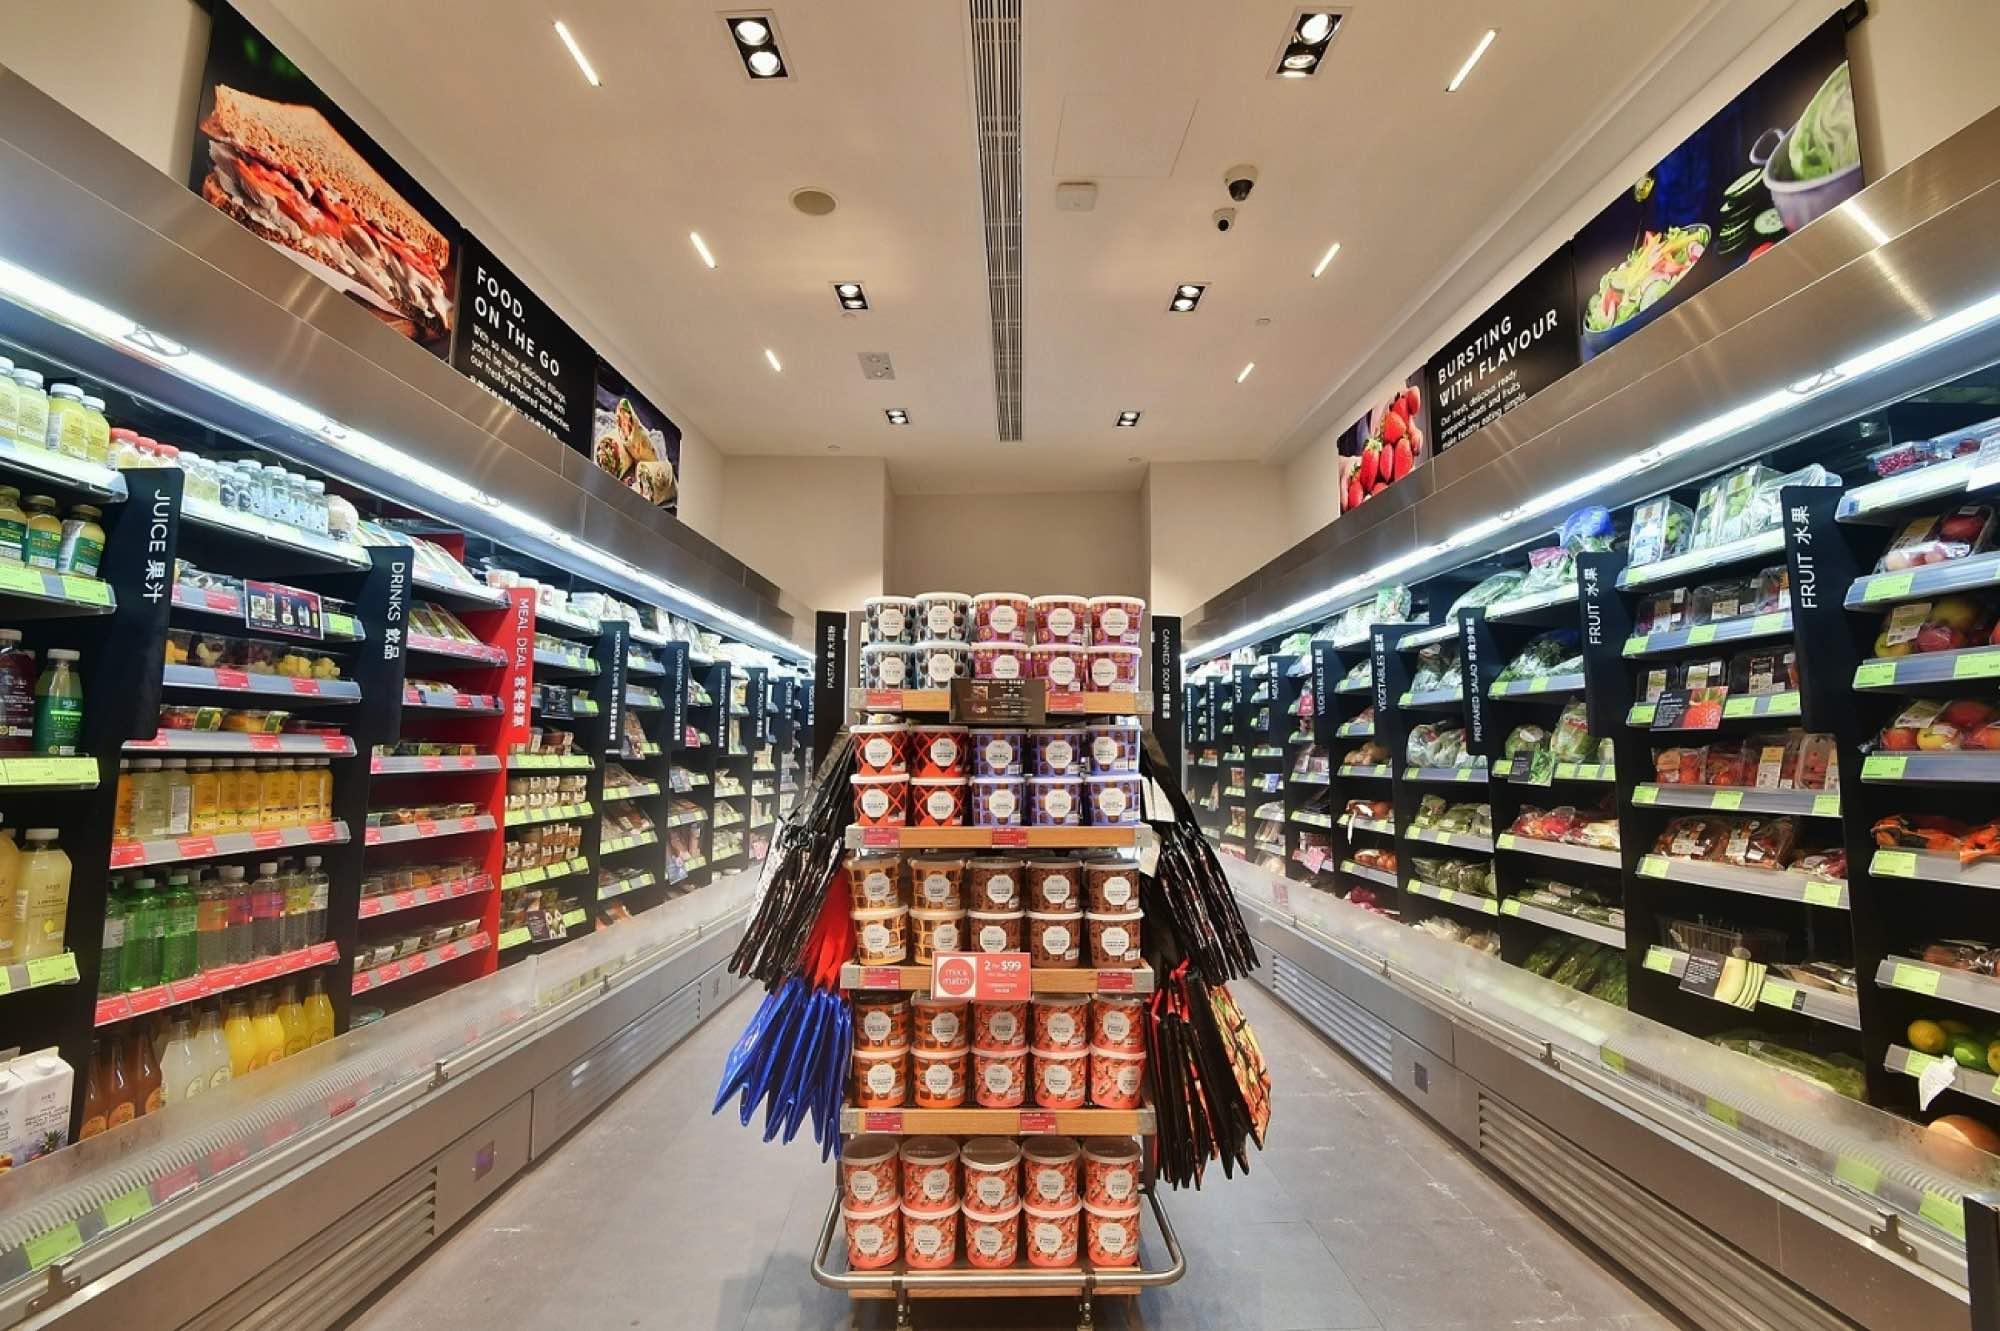 MARKS & SPENCER 荃新天地分店開幕 獨家限定優惠食品服飾全部有份